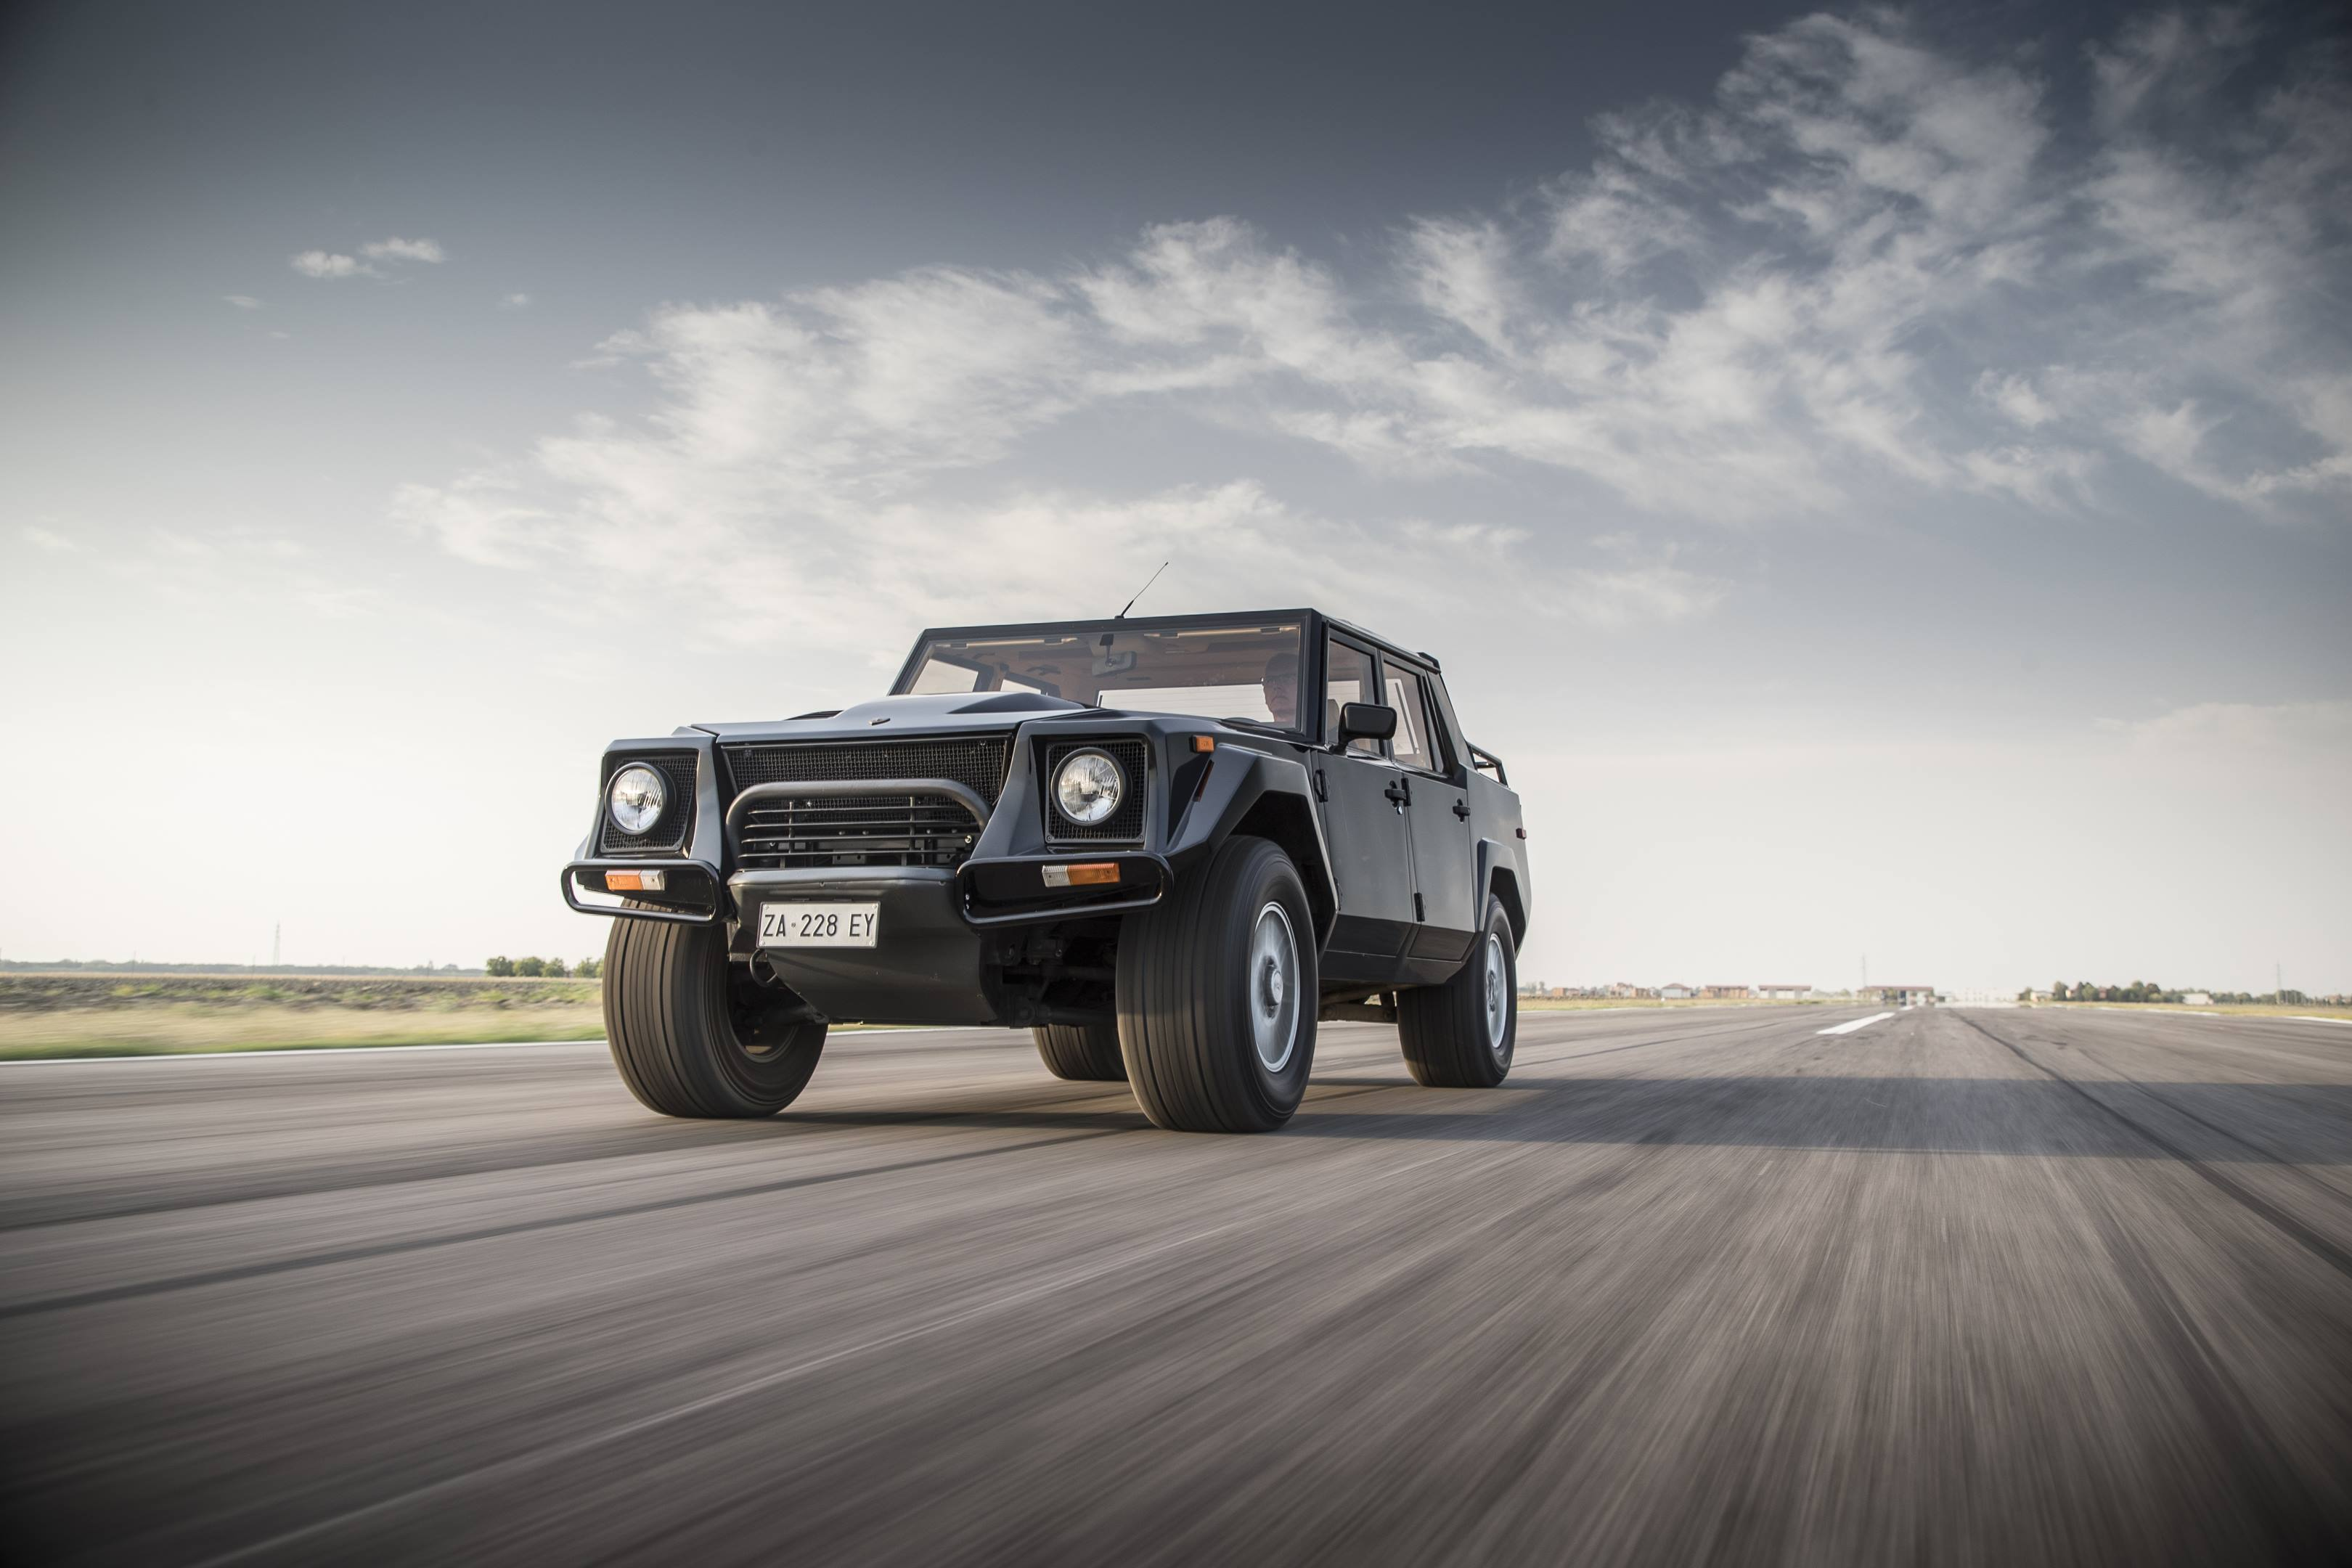 Lamborghini LM002 front